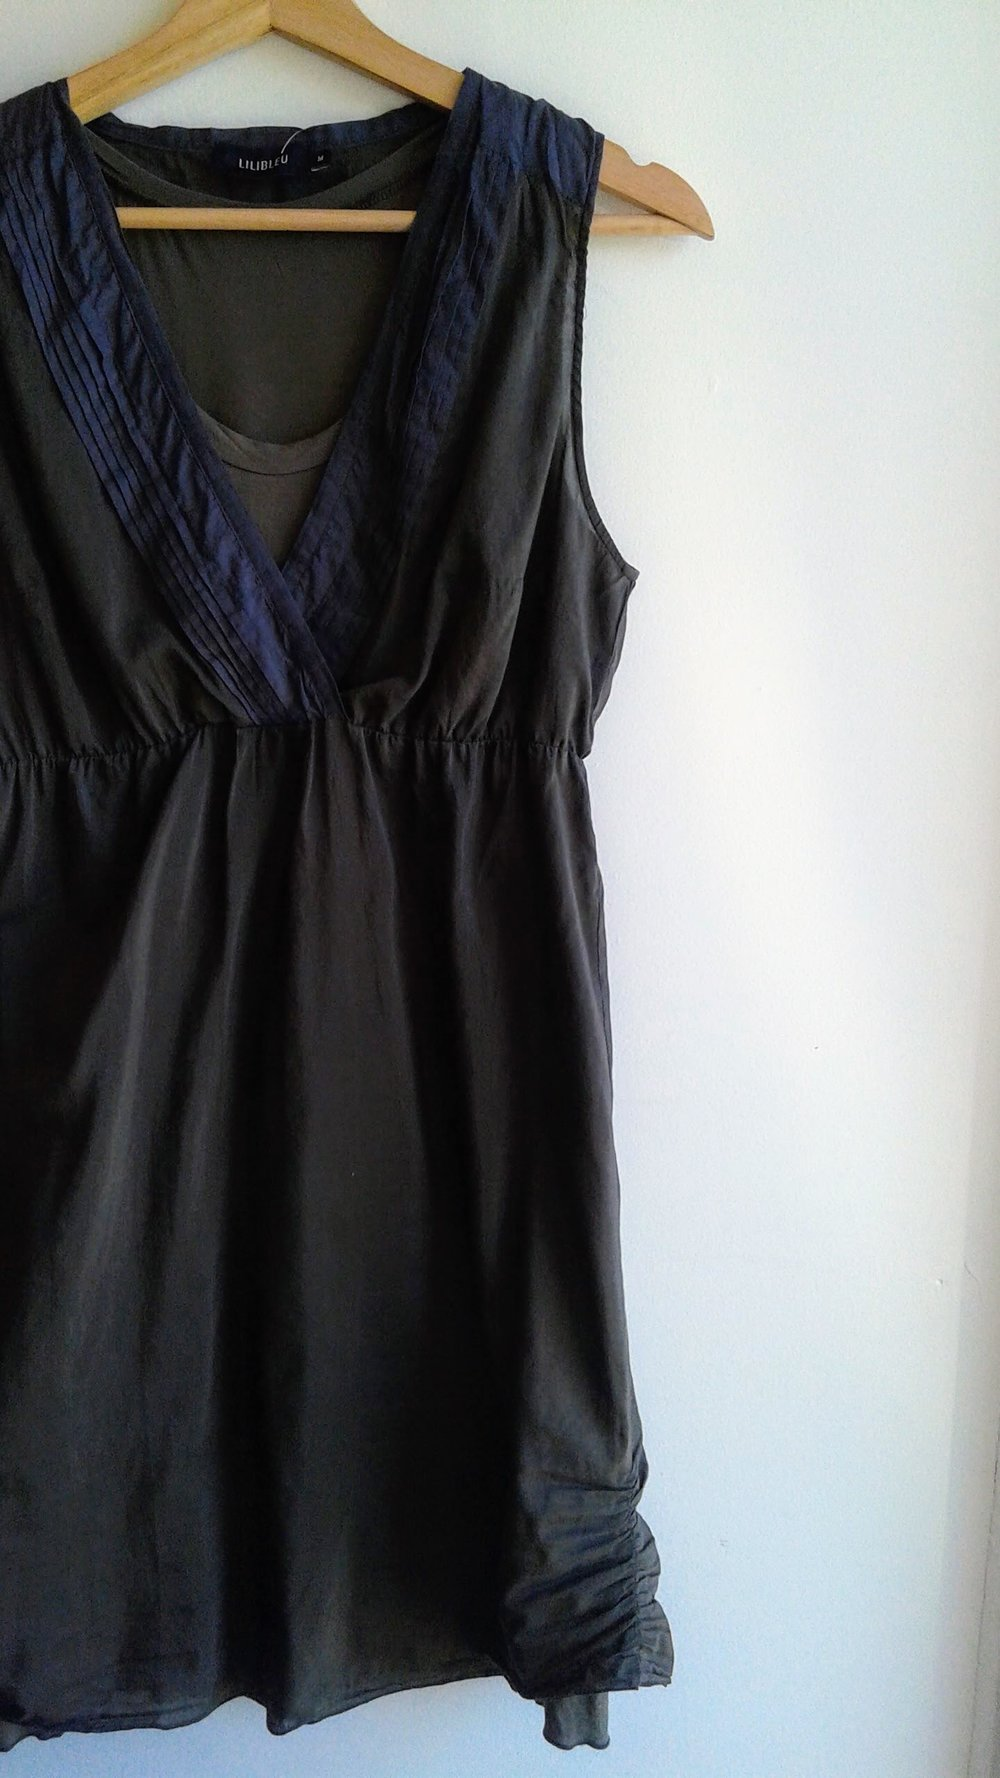 Lilibleu dress; Size M, $32